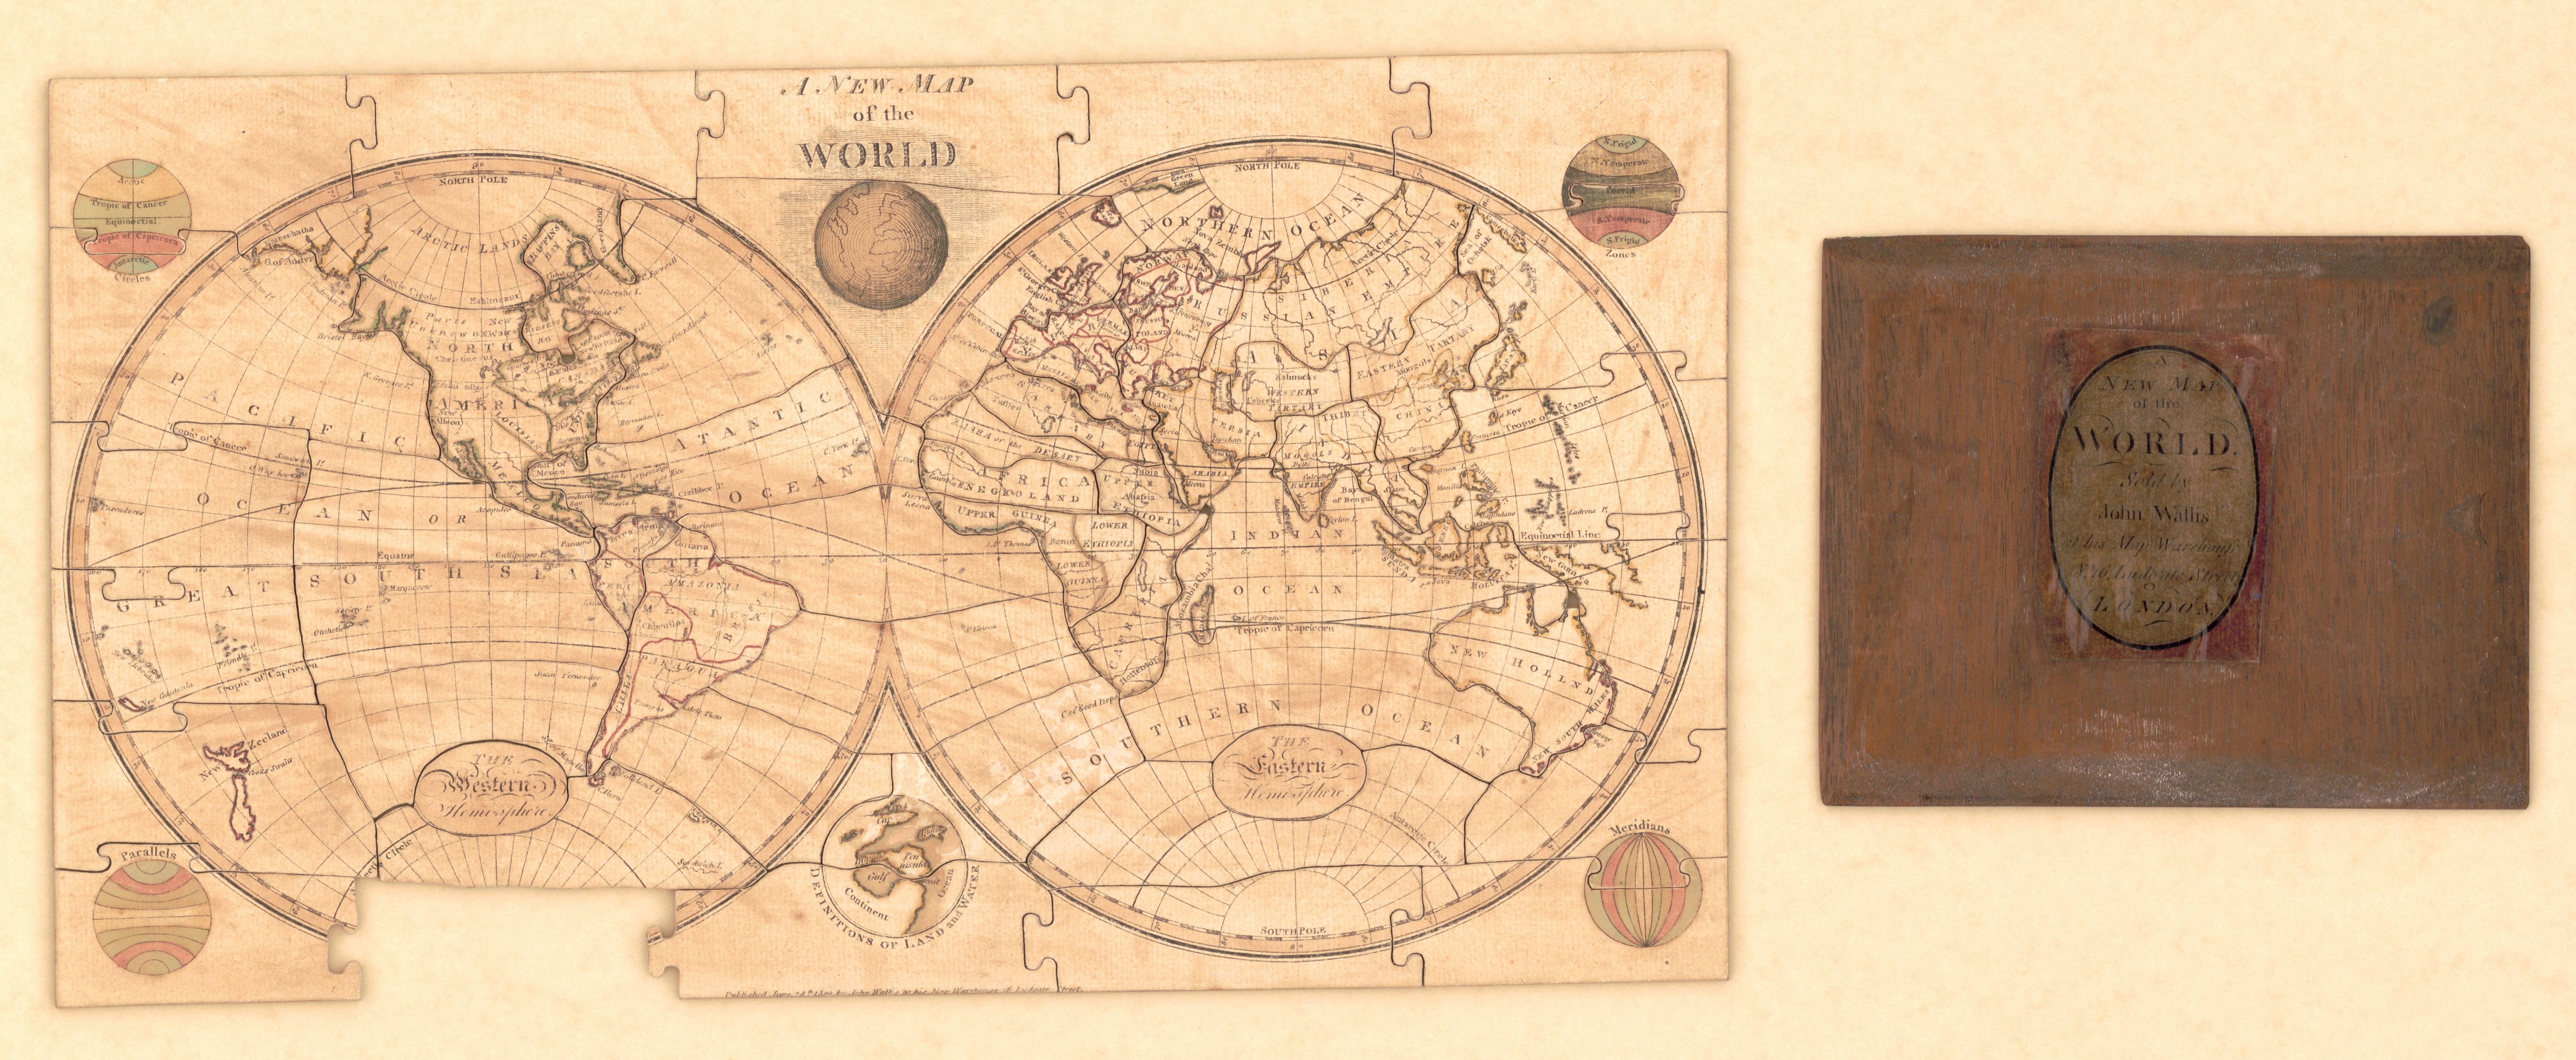 File:A new map of the world. LOC 85694393.jpg - Wikimedia ...